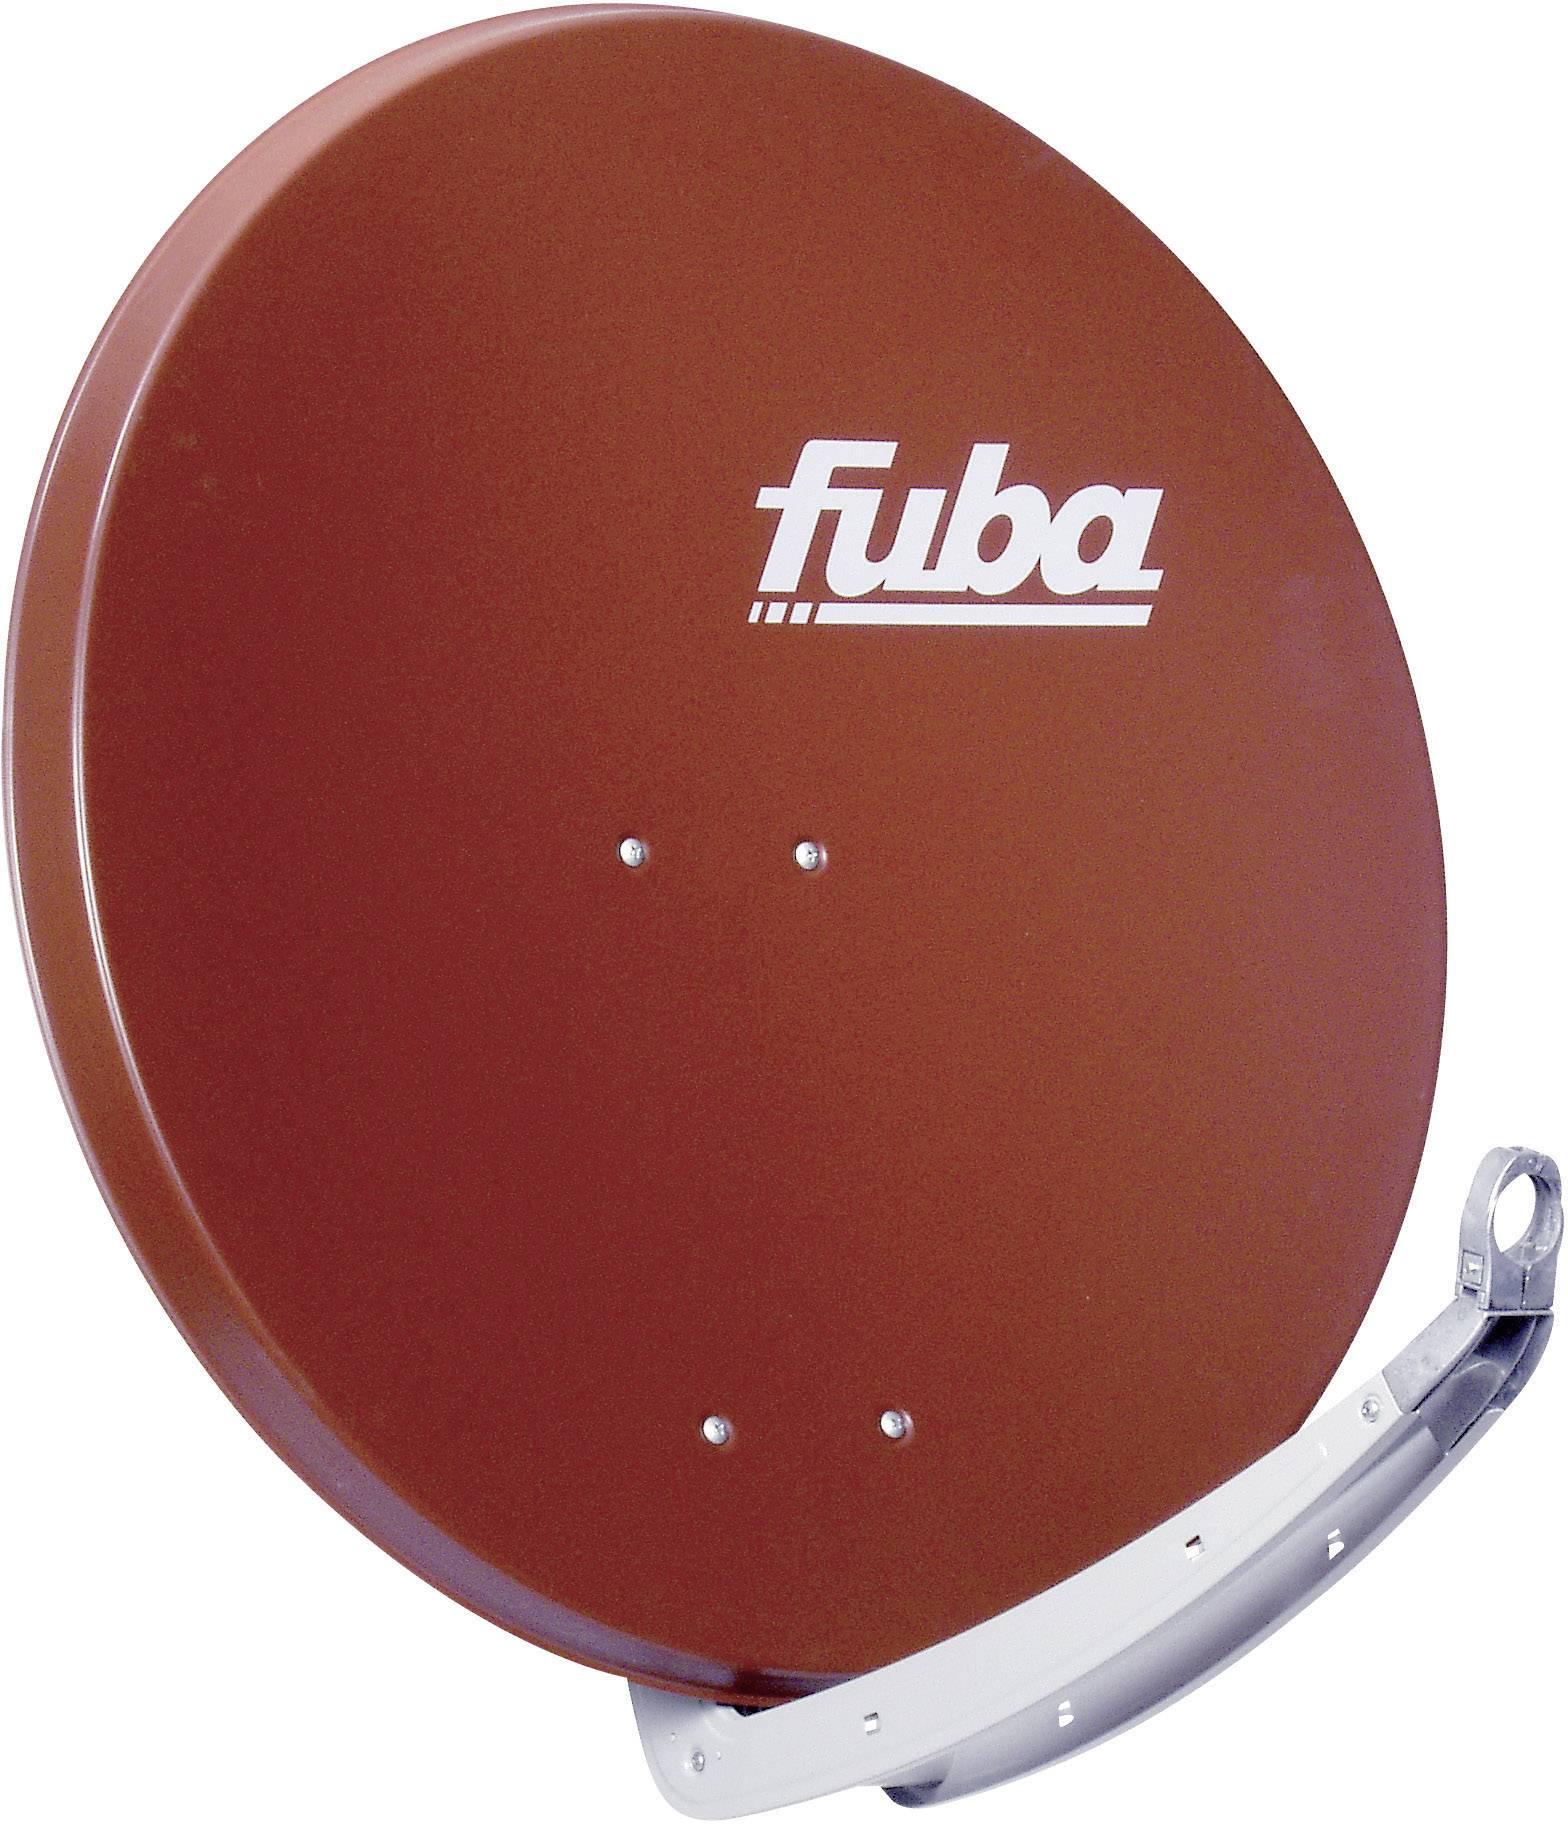 Satelitní anténa, Fuba DAA 850 R, 85 cm, červená